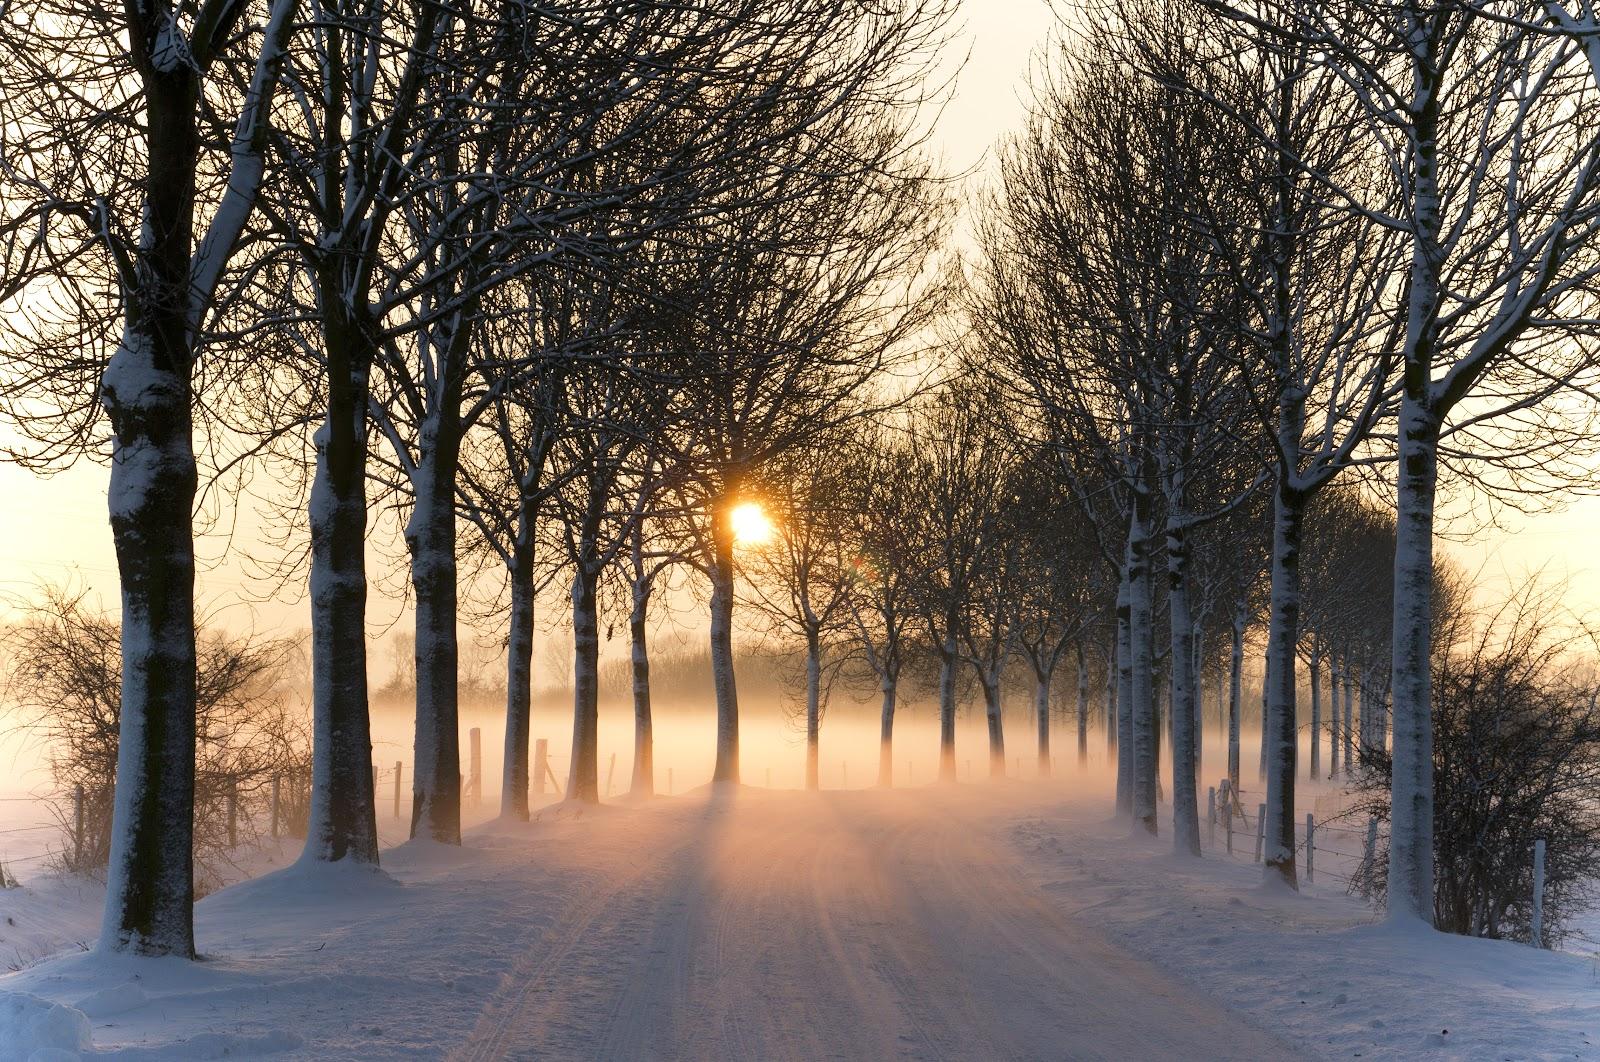 Misty_winter_afternoon_(5277611659).jpg